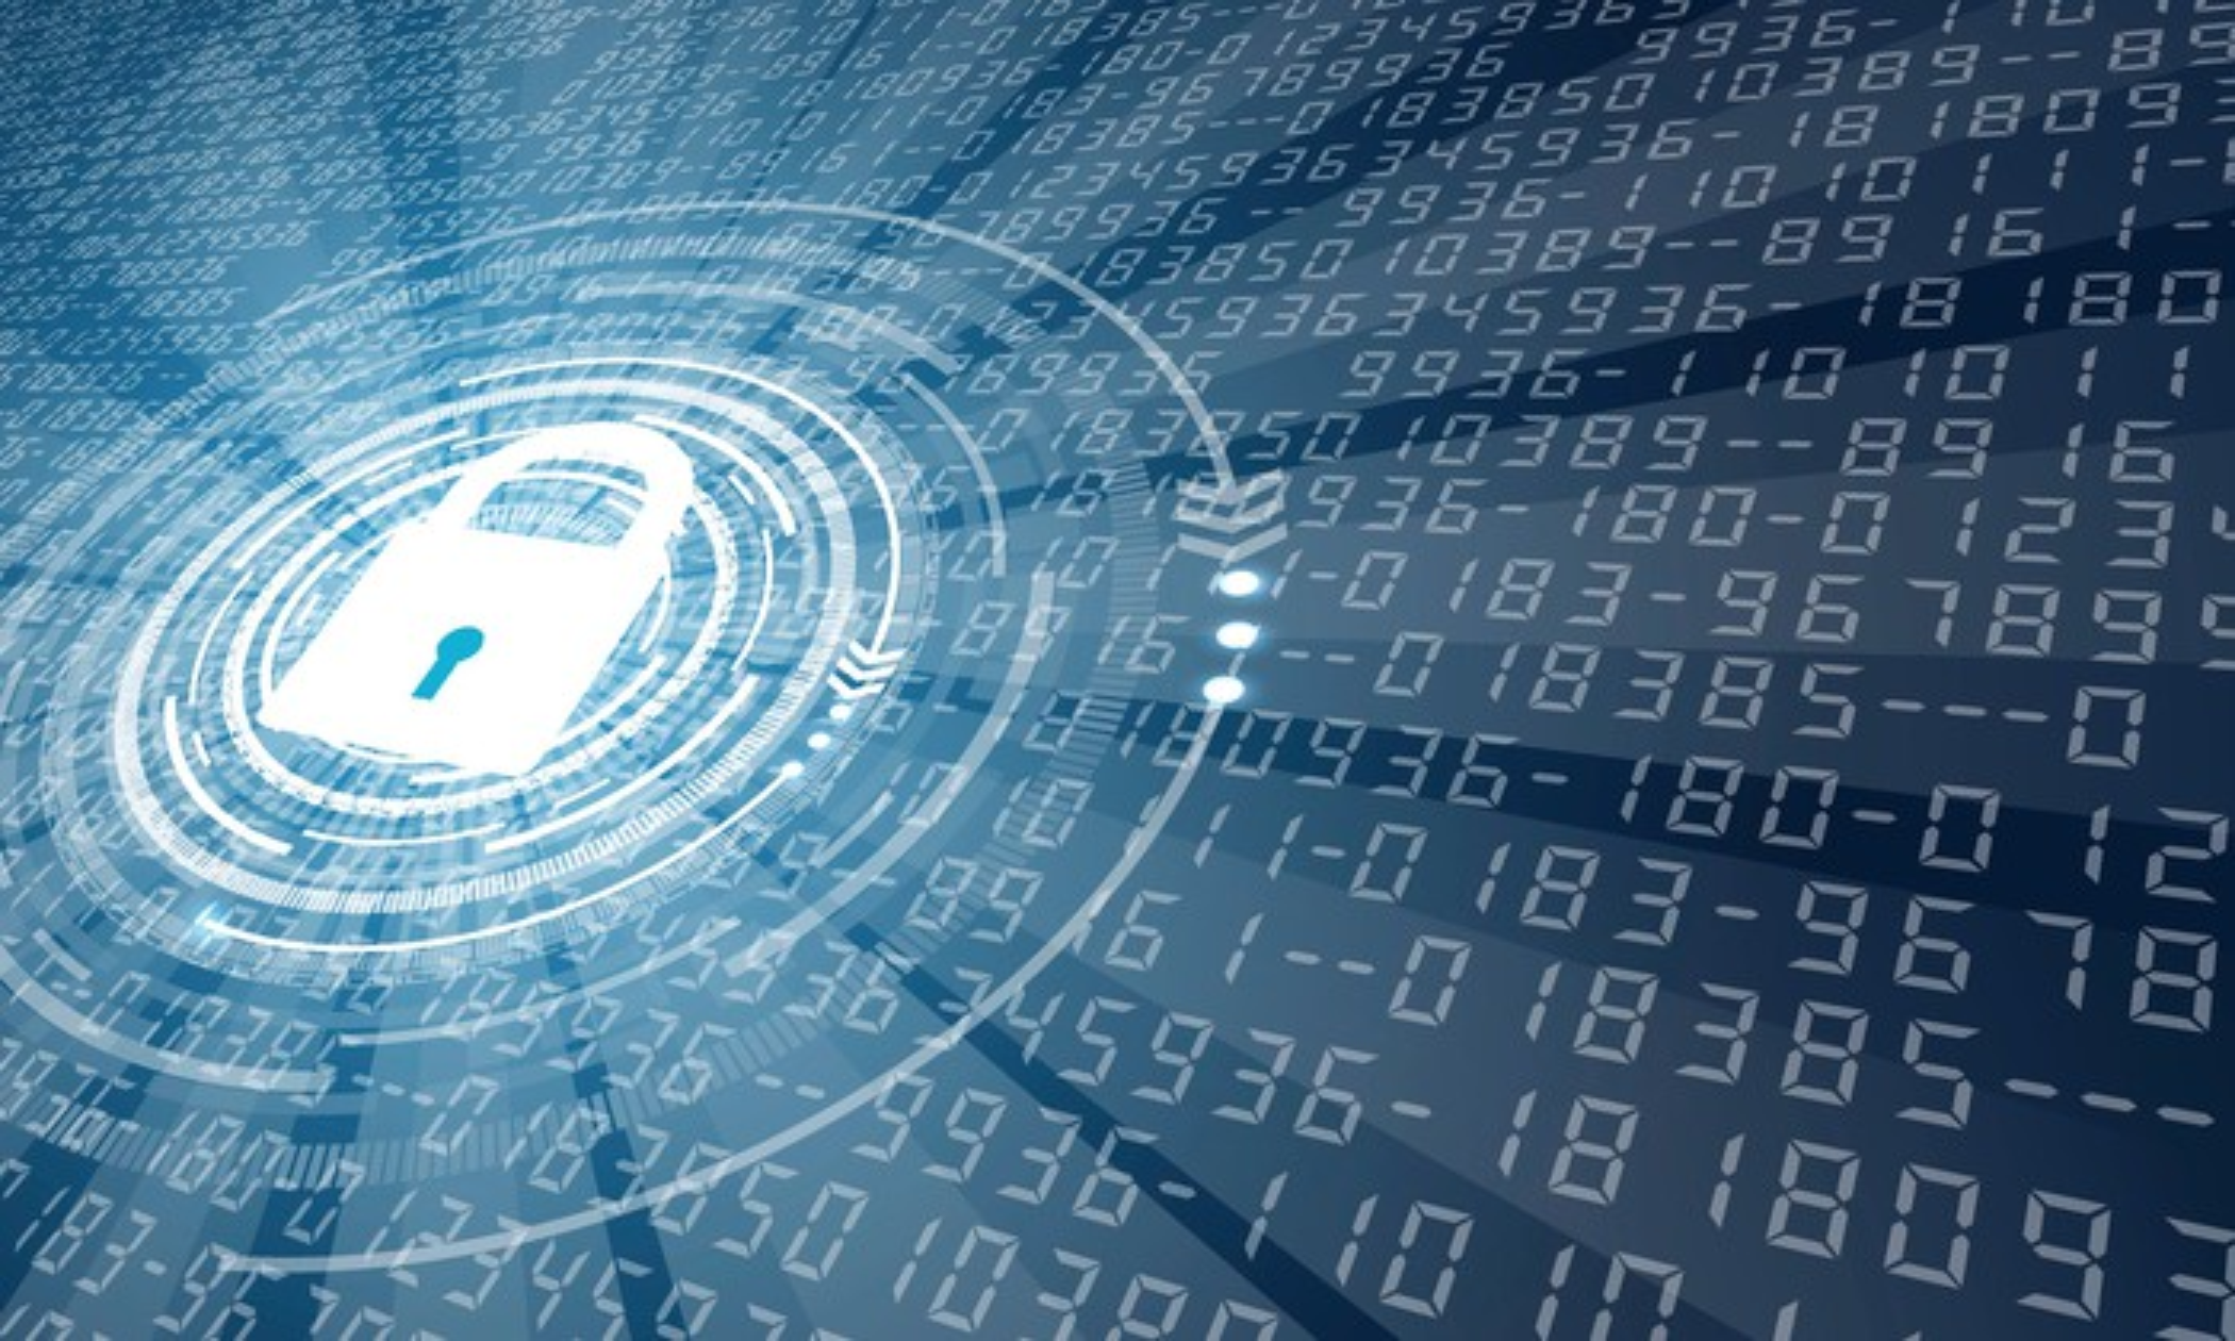 Digital padlock overlaying random numbers, cybersecurity image